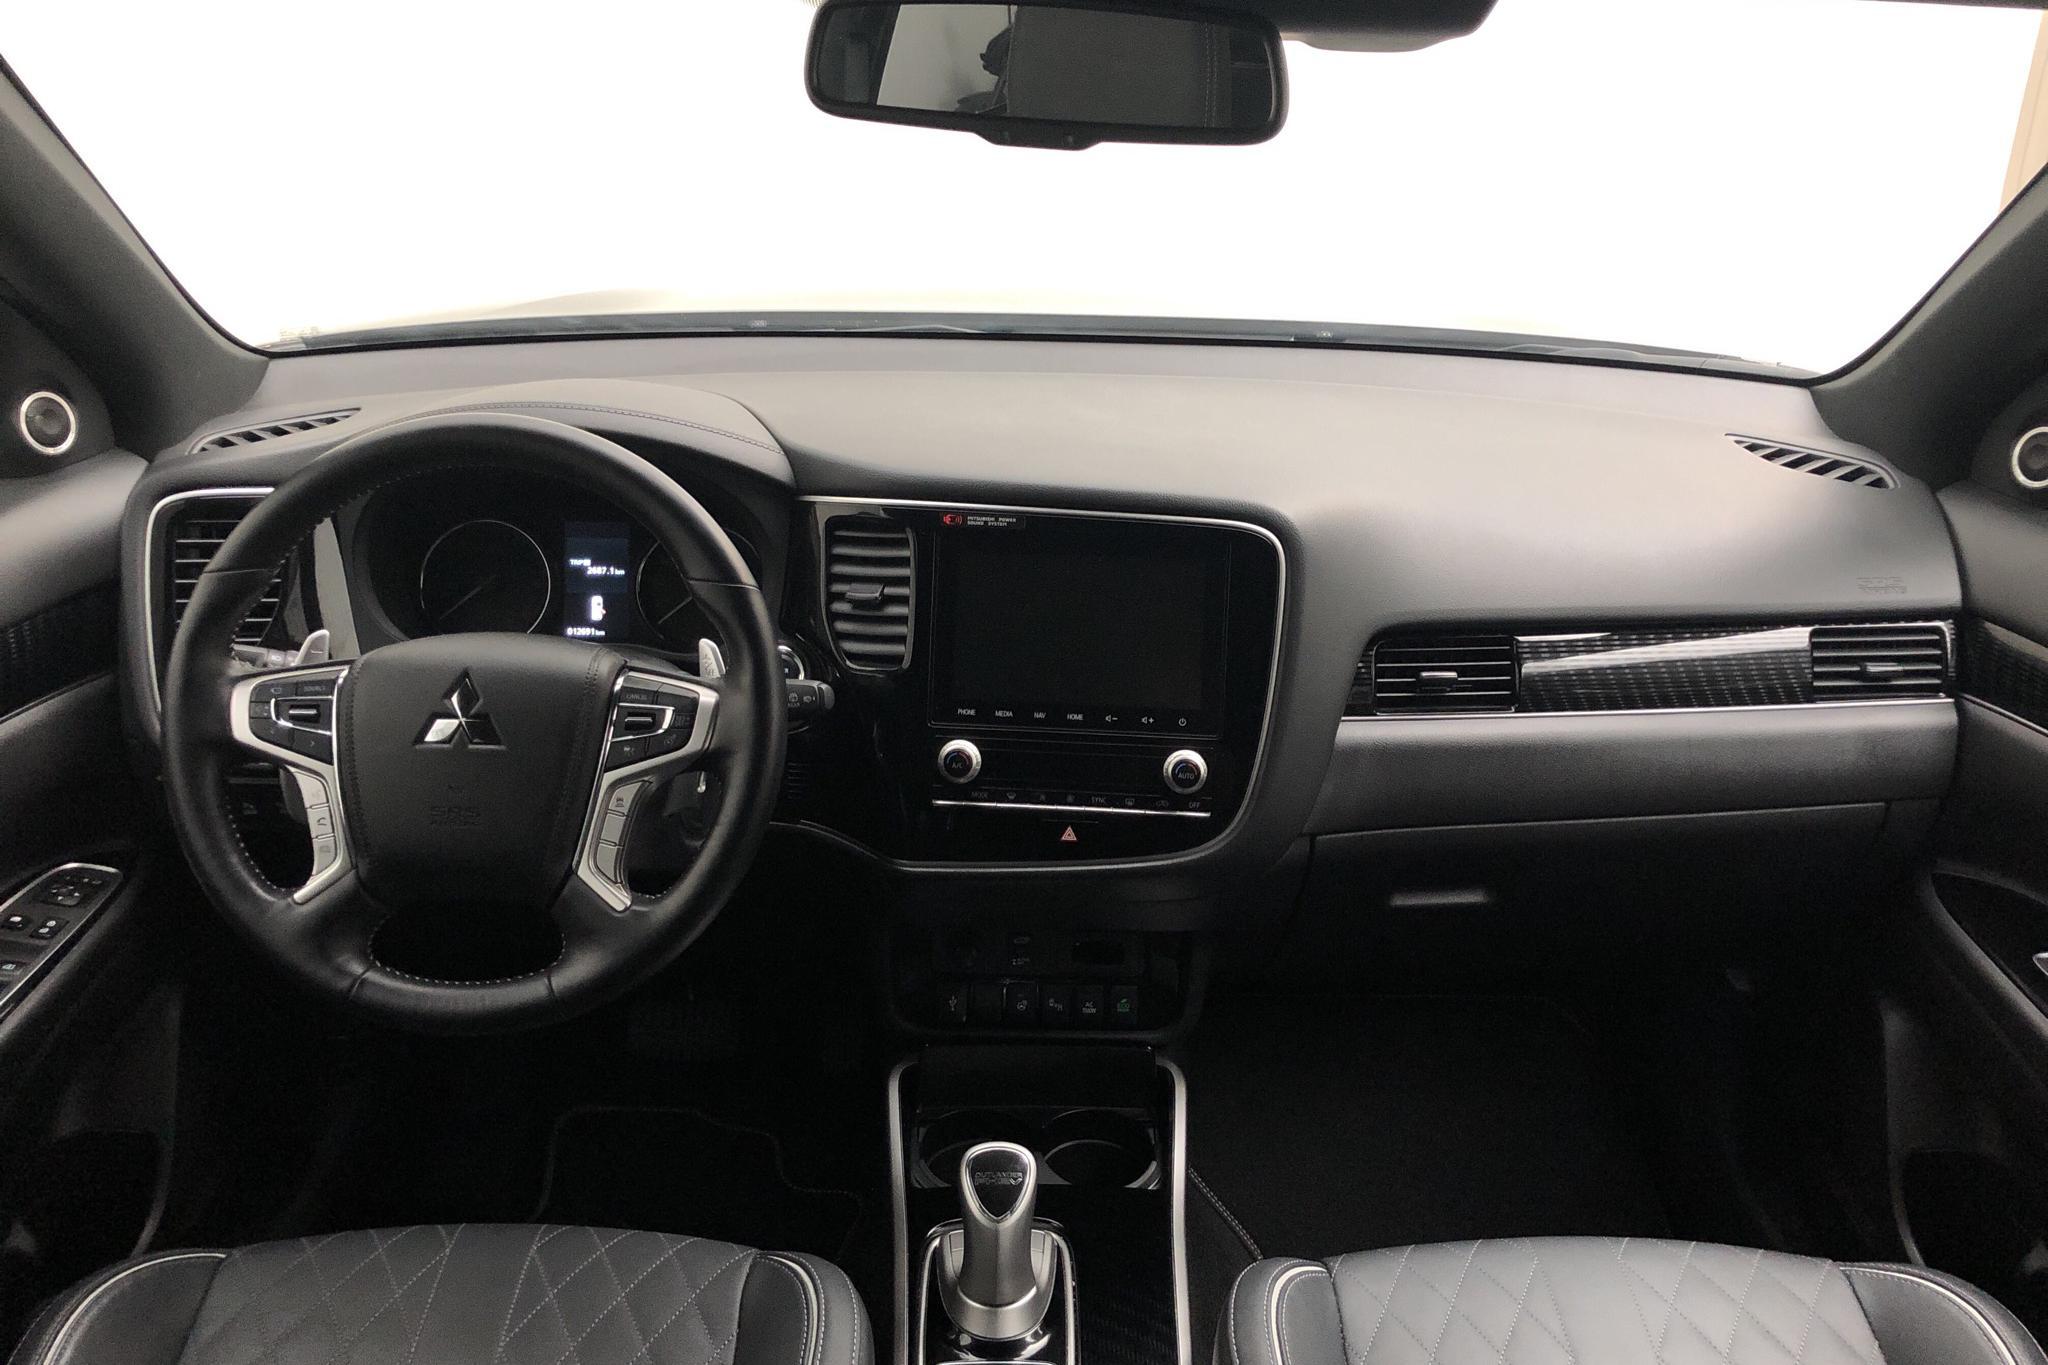 Mitsubishi Outlander 2.4 Plug-in Hybrid 4WD (136hk) - 12 690 km - Automatic - black - 2020